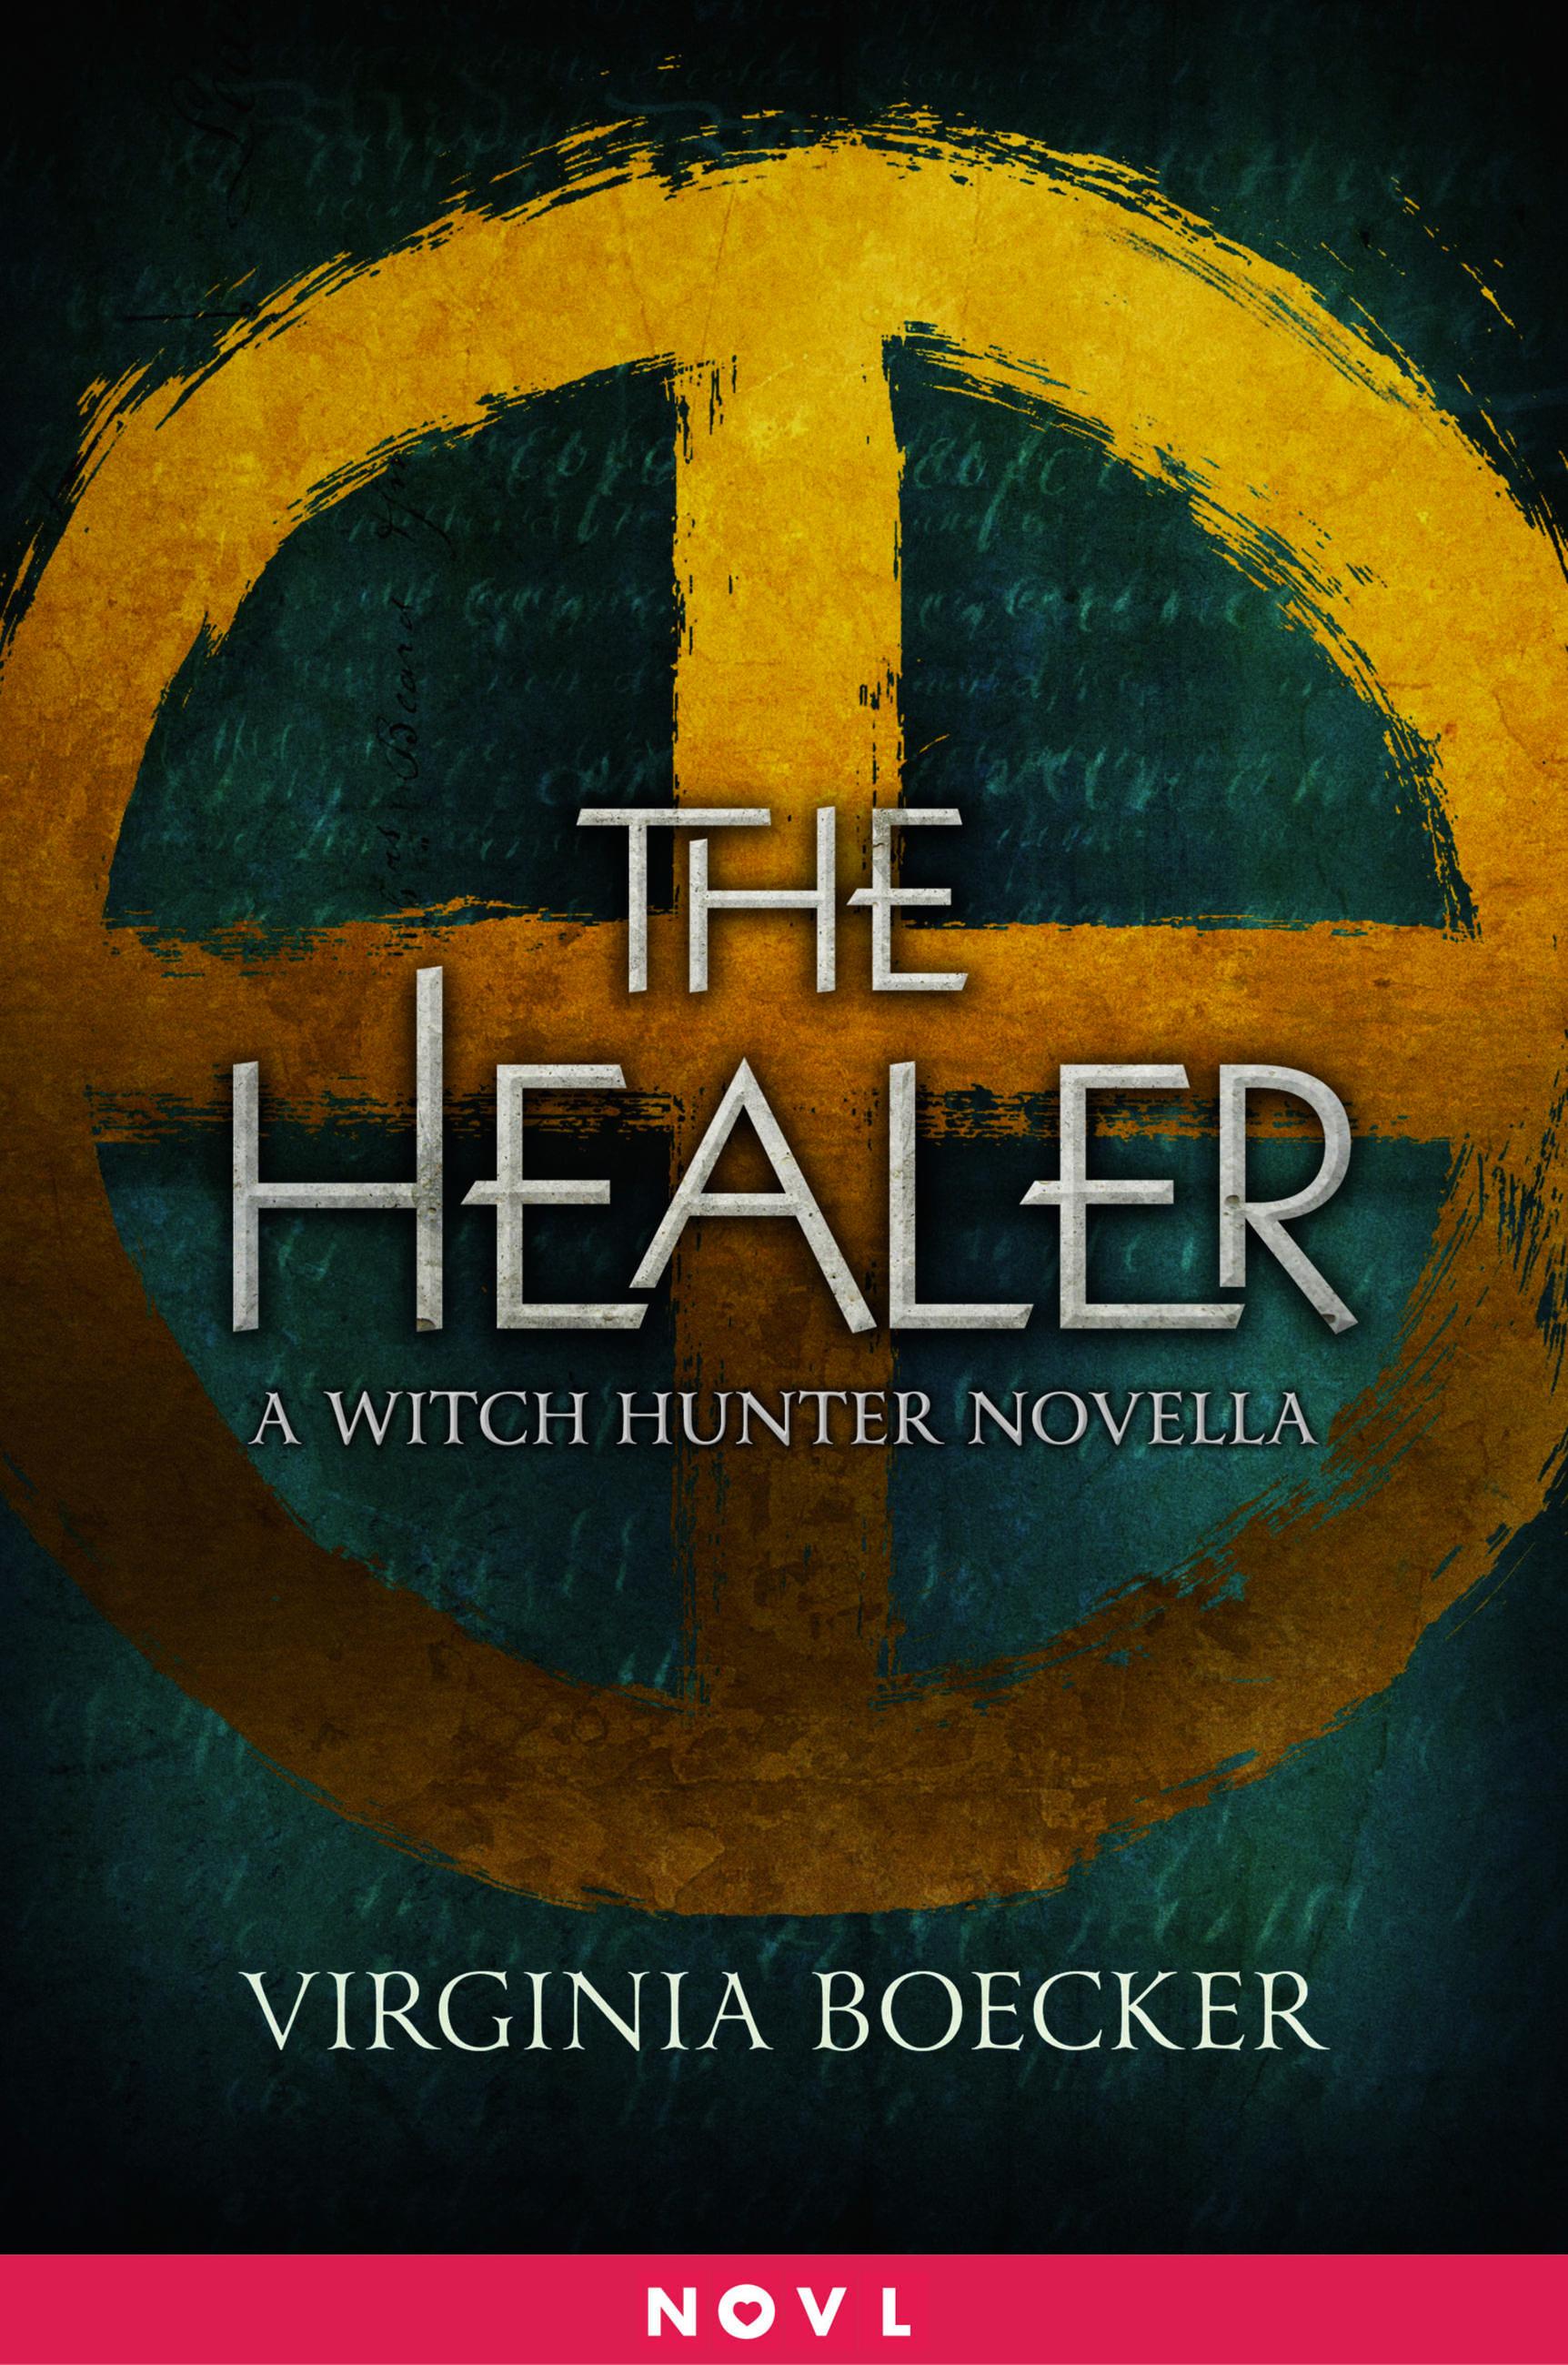 The Healer by Virginia Boecker | Hachette Book Group